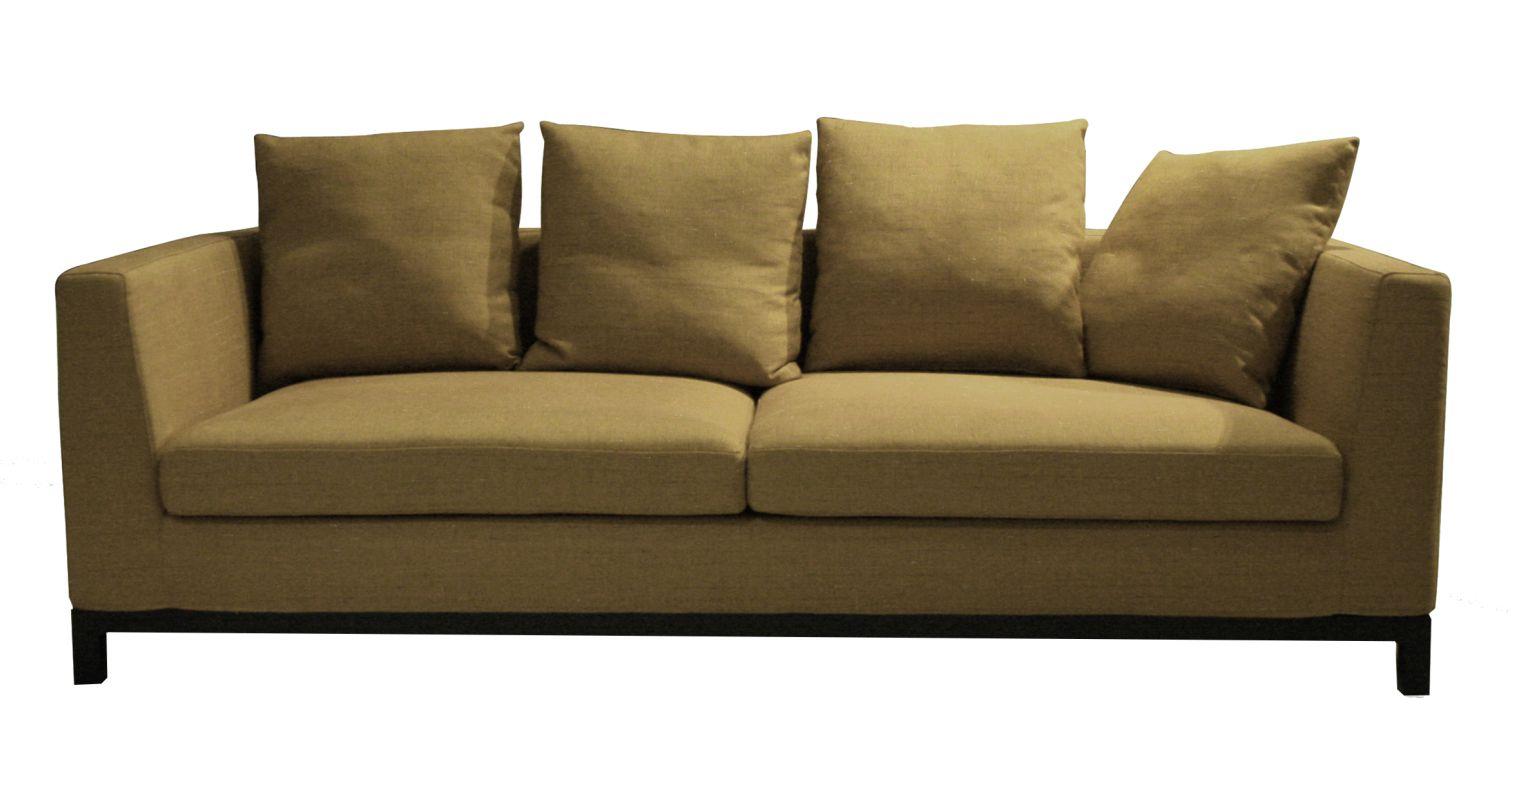 Genova 3 Seater Sofa By Distinction Furniture Furn Sofa Pinterest # Meuble Tv Genova